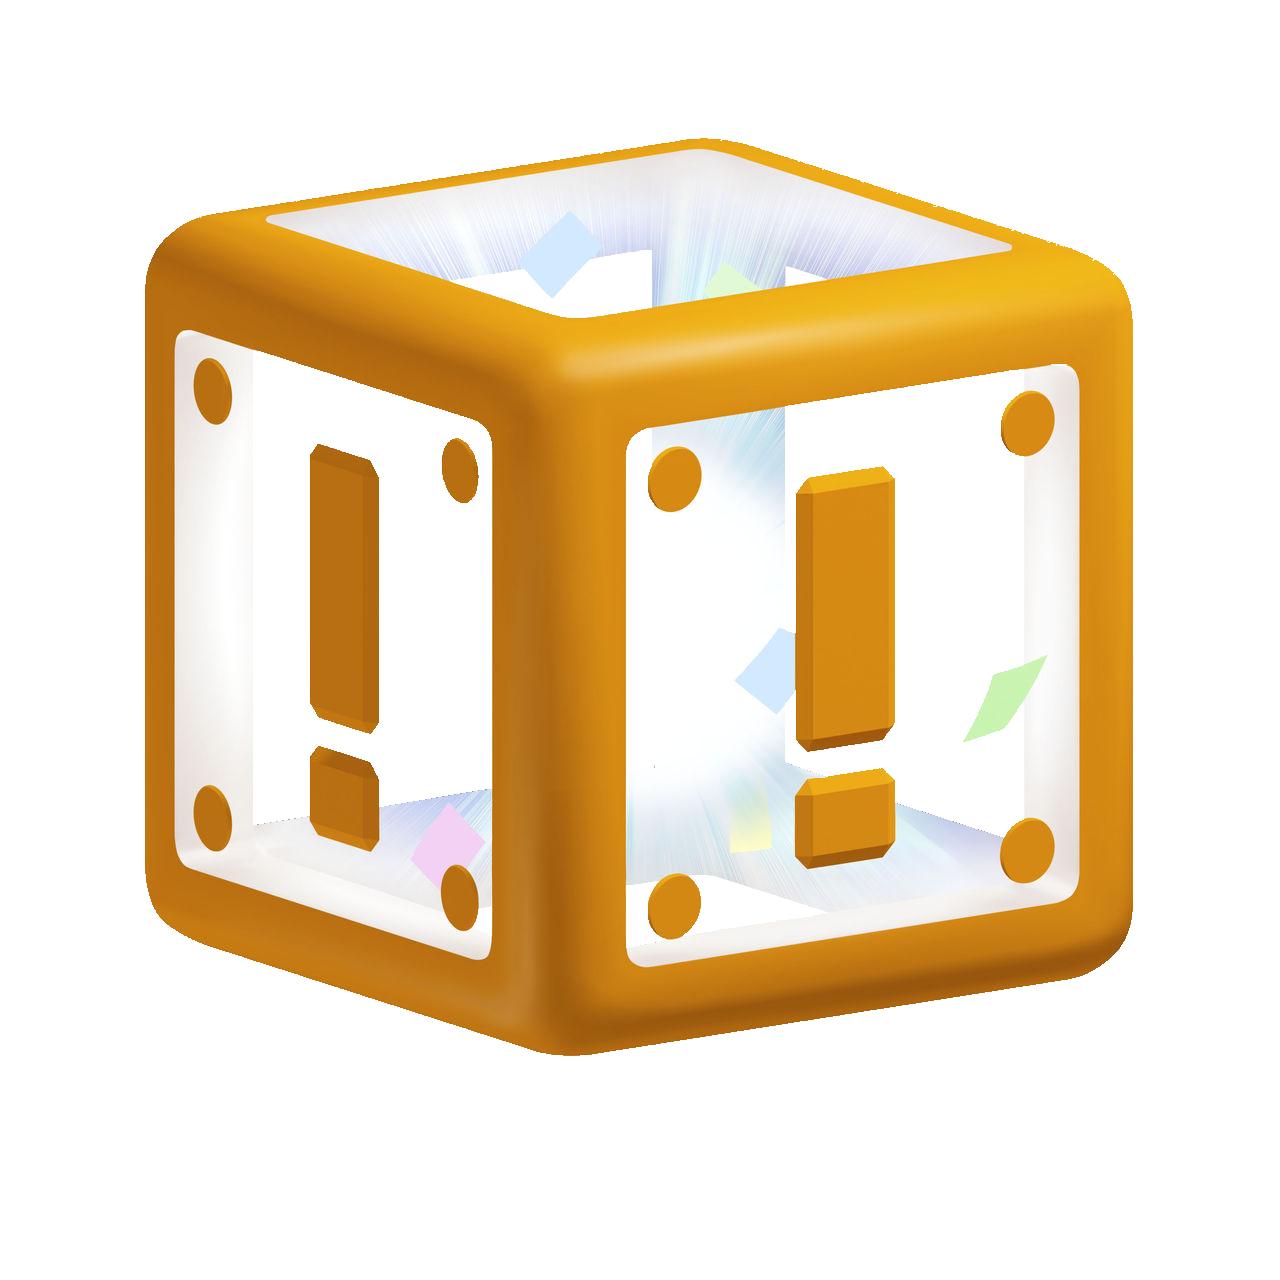 Mystery clipart mystery box #15